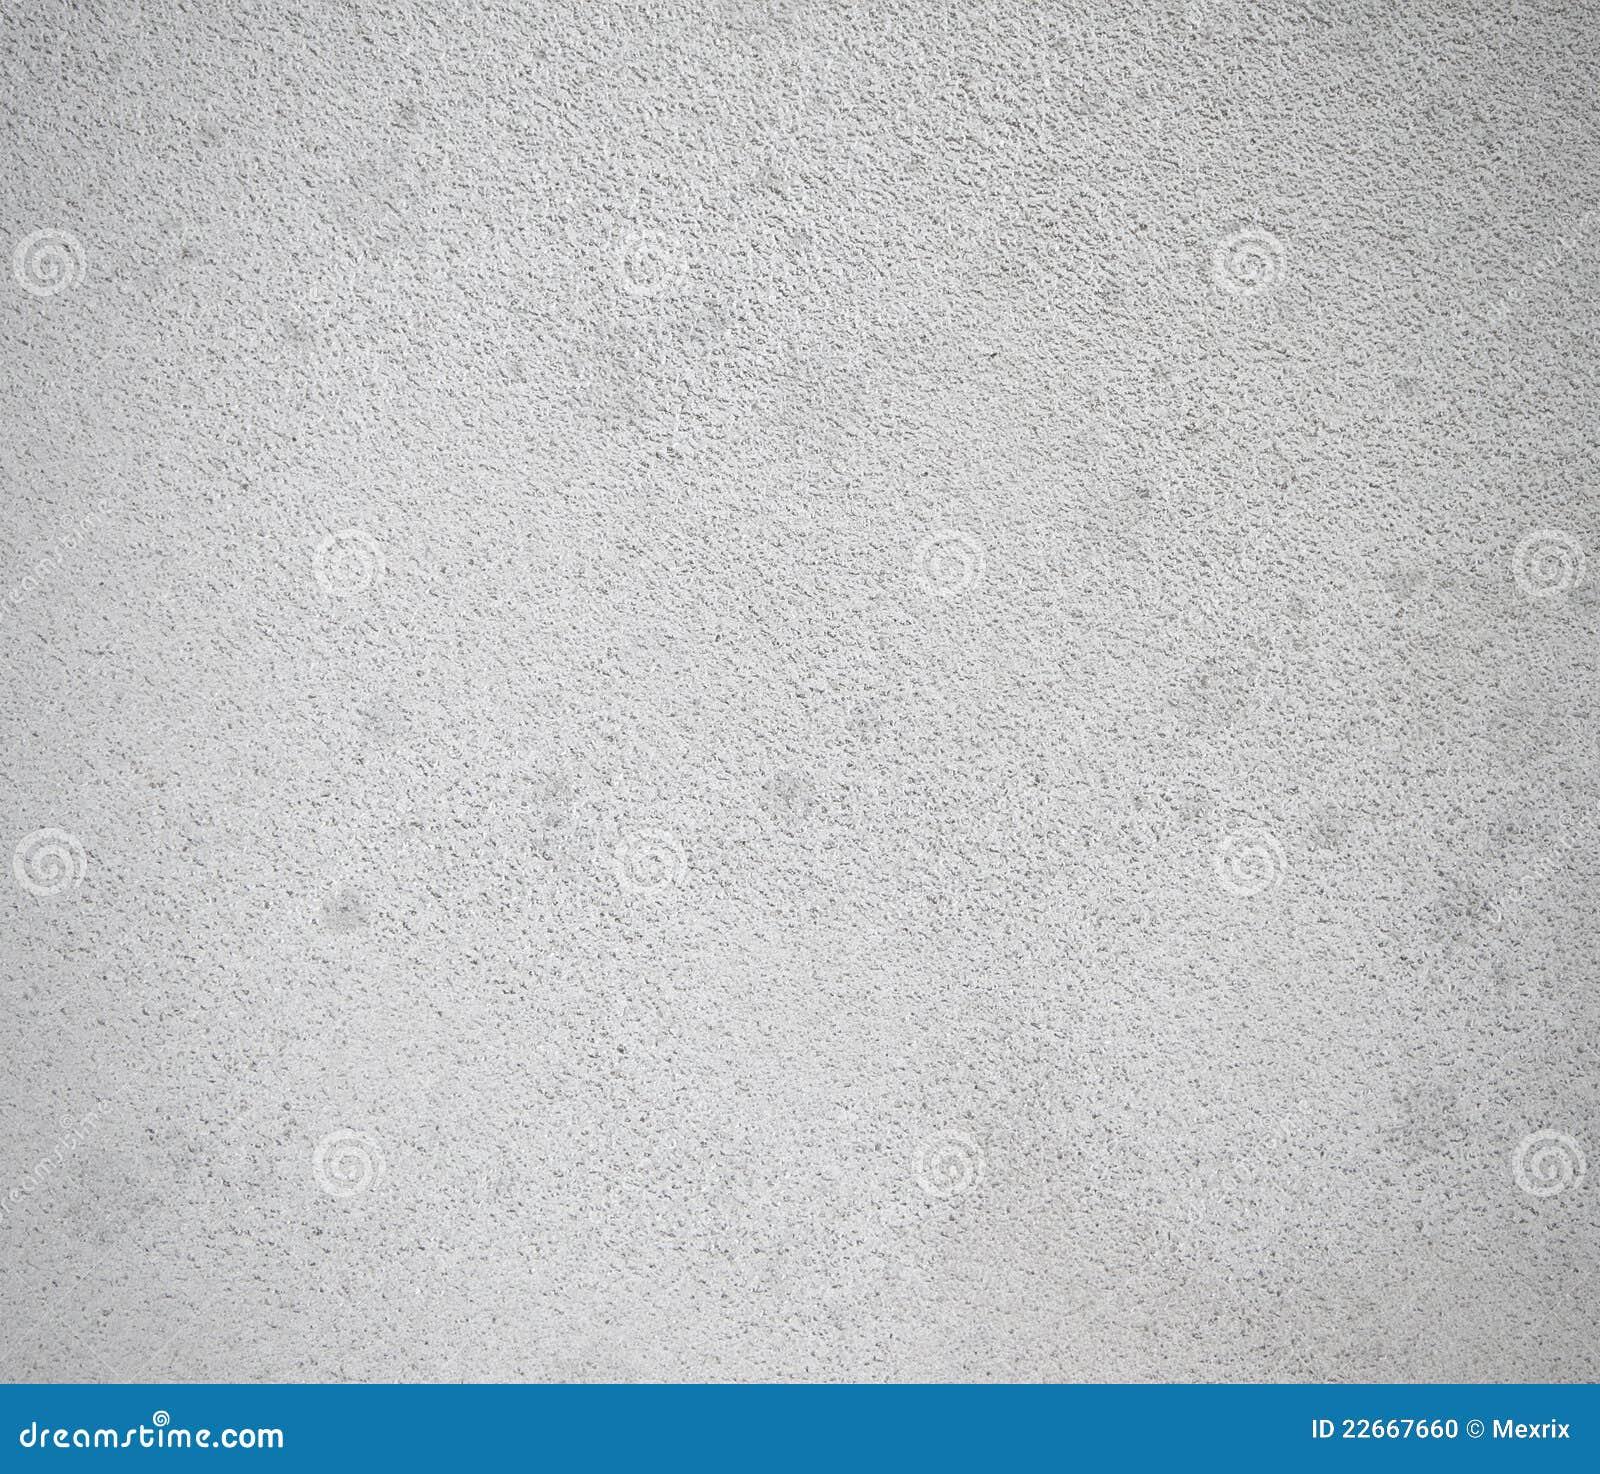 Cast Iron Texture Stock Photo Image 22667660